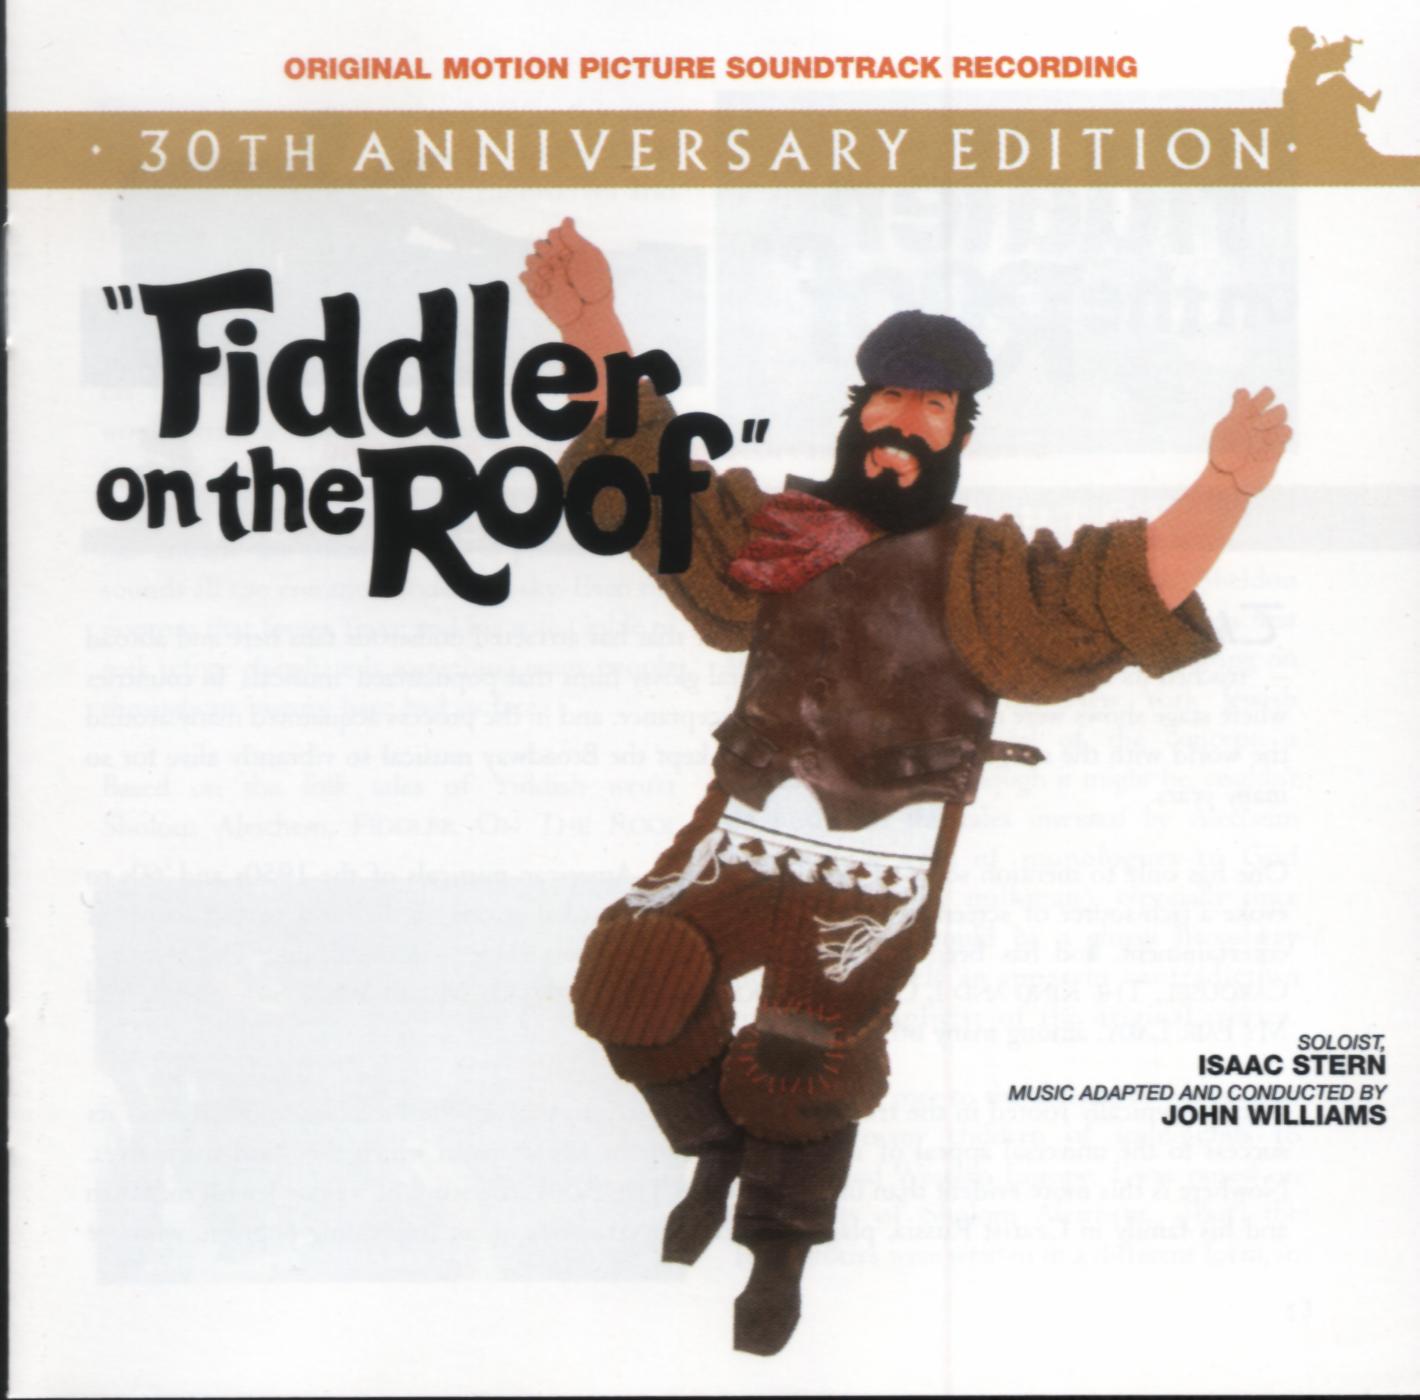 Inventario De Estrellas Fiddler On The Roof Ost